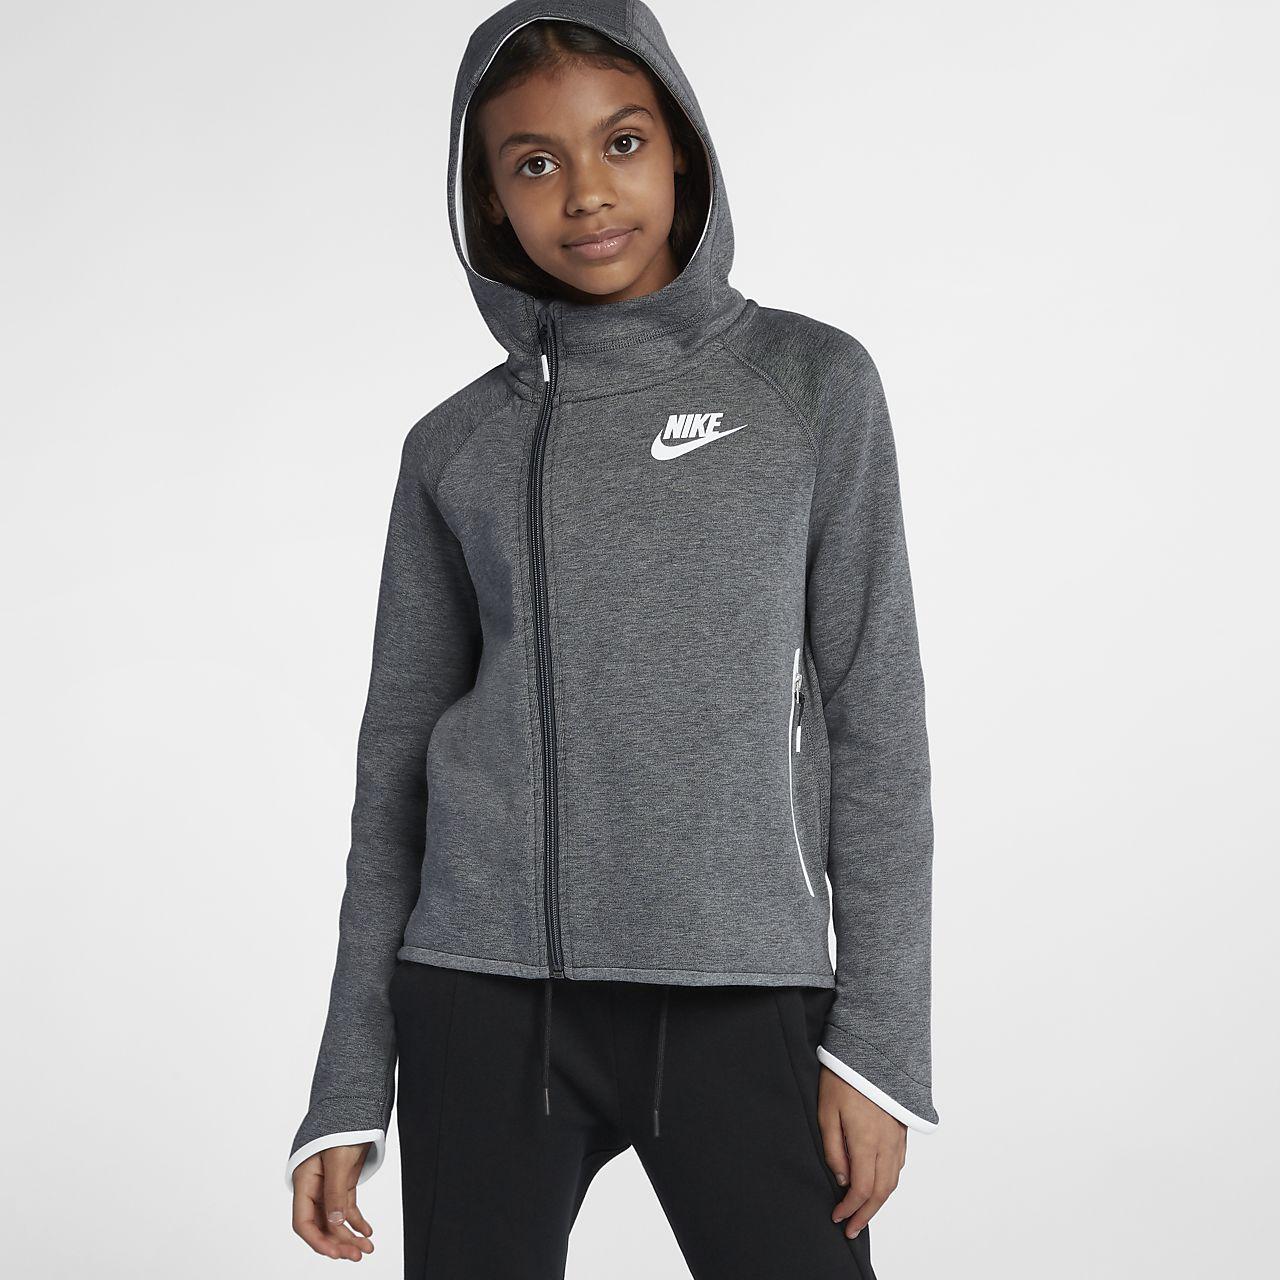 Nike Sportswear Tech Fleece Big Kids  (Girls ) Full-Zip Hoodie. Nike.com 82f254711bf1